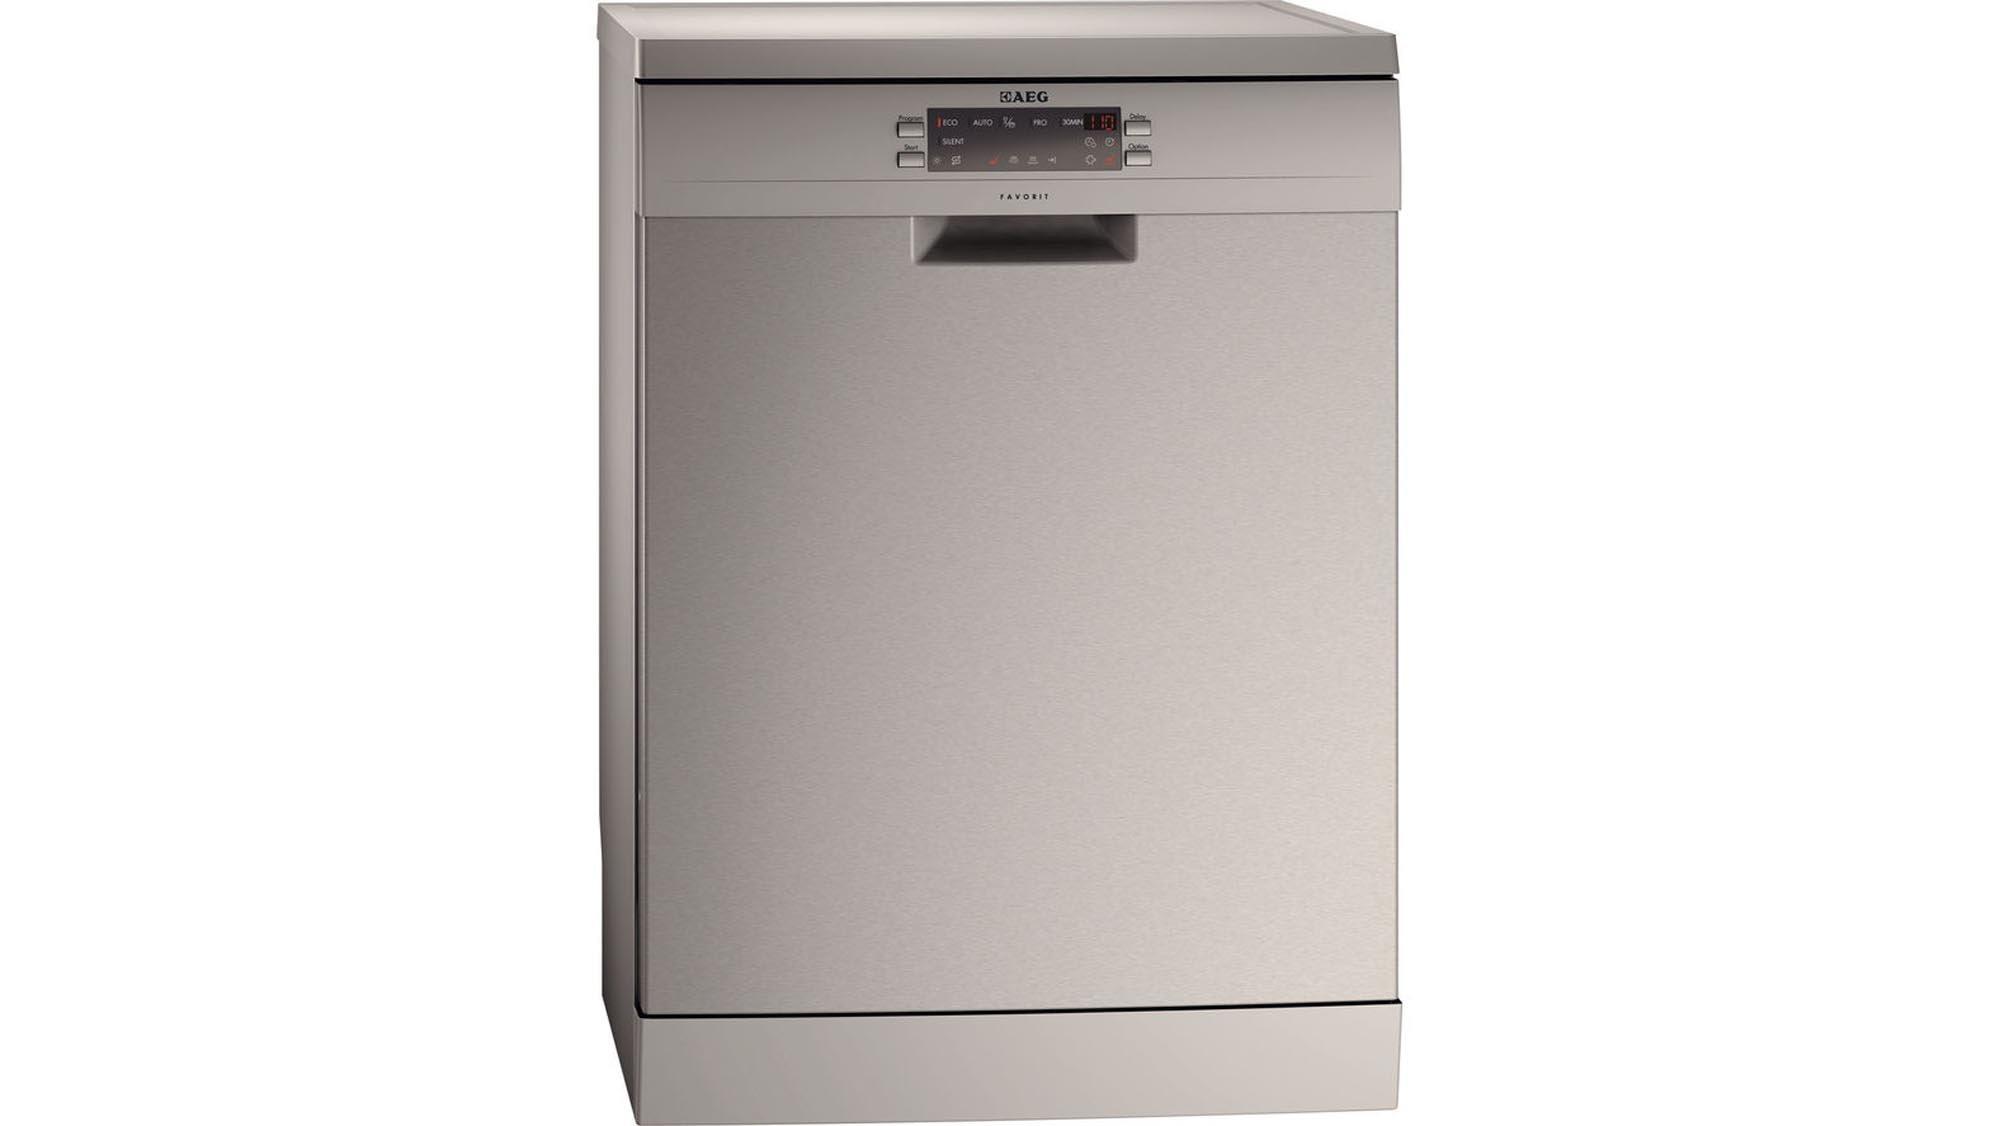 Quietest Dishwasher Best Dishwasher The Best Dishwashers To Buy From Alb250 Expert